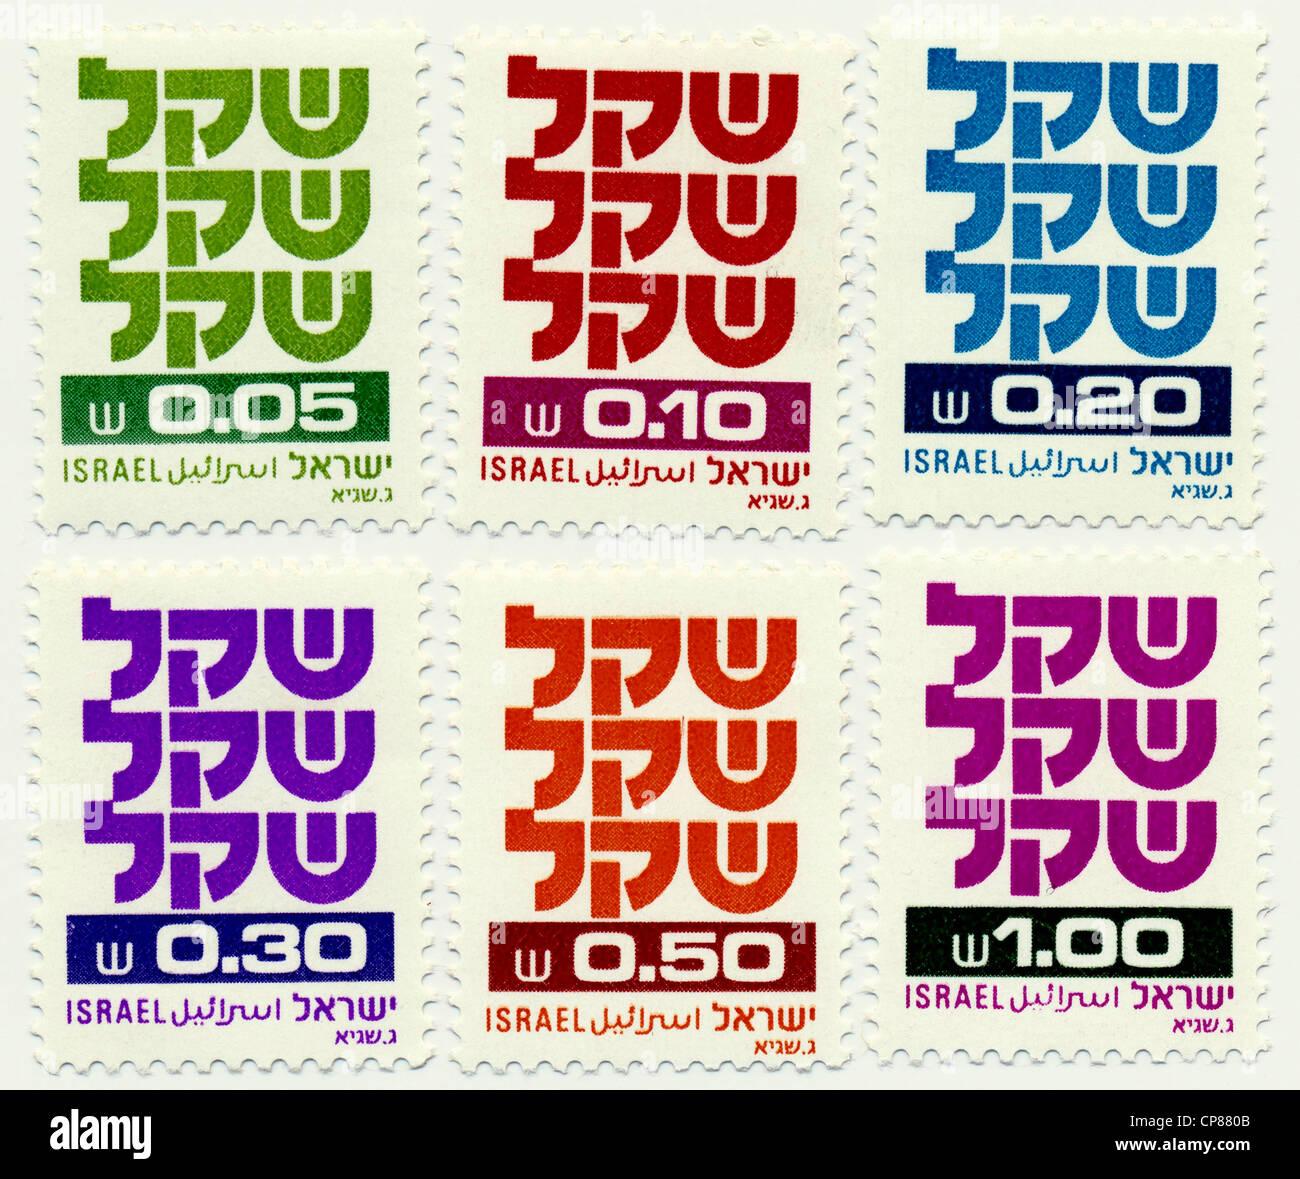 Historic postage stamps from Israel, the Hebrew word Shekel, Historische Briefmarken, der hebräische Name Schekel, - Stock Image